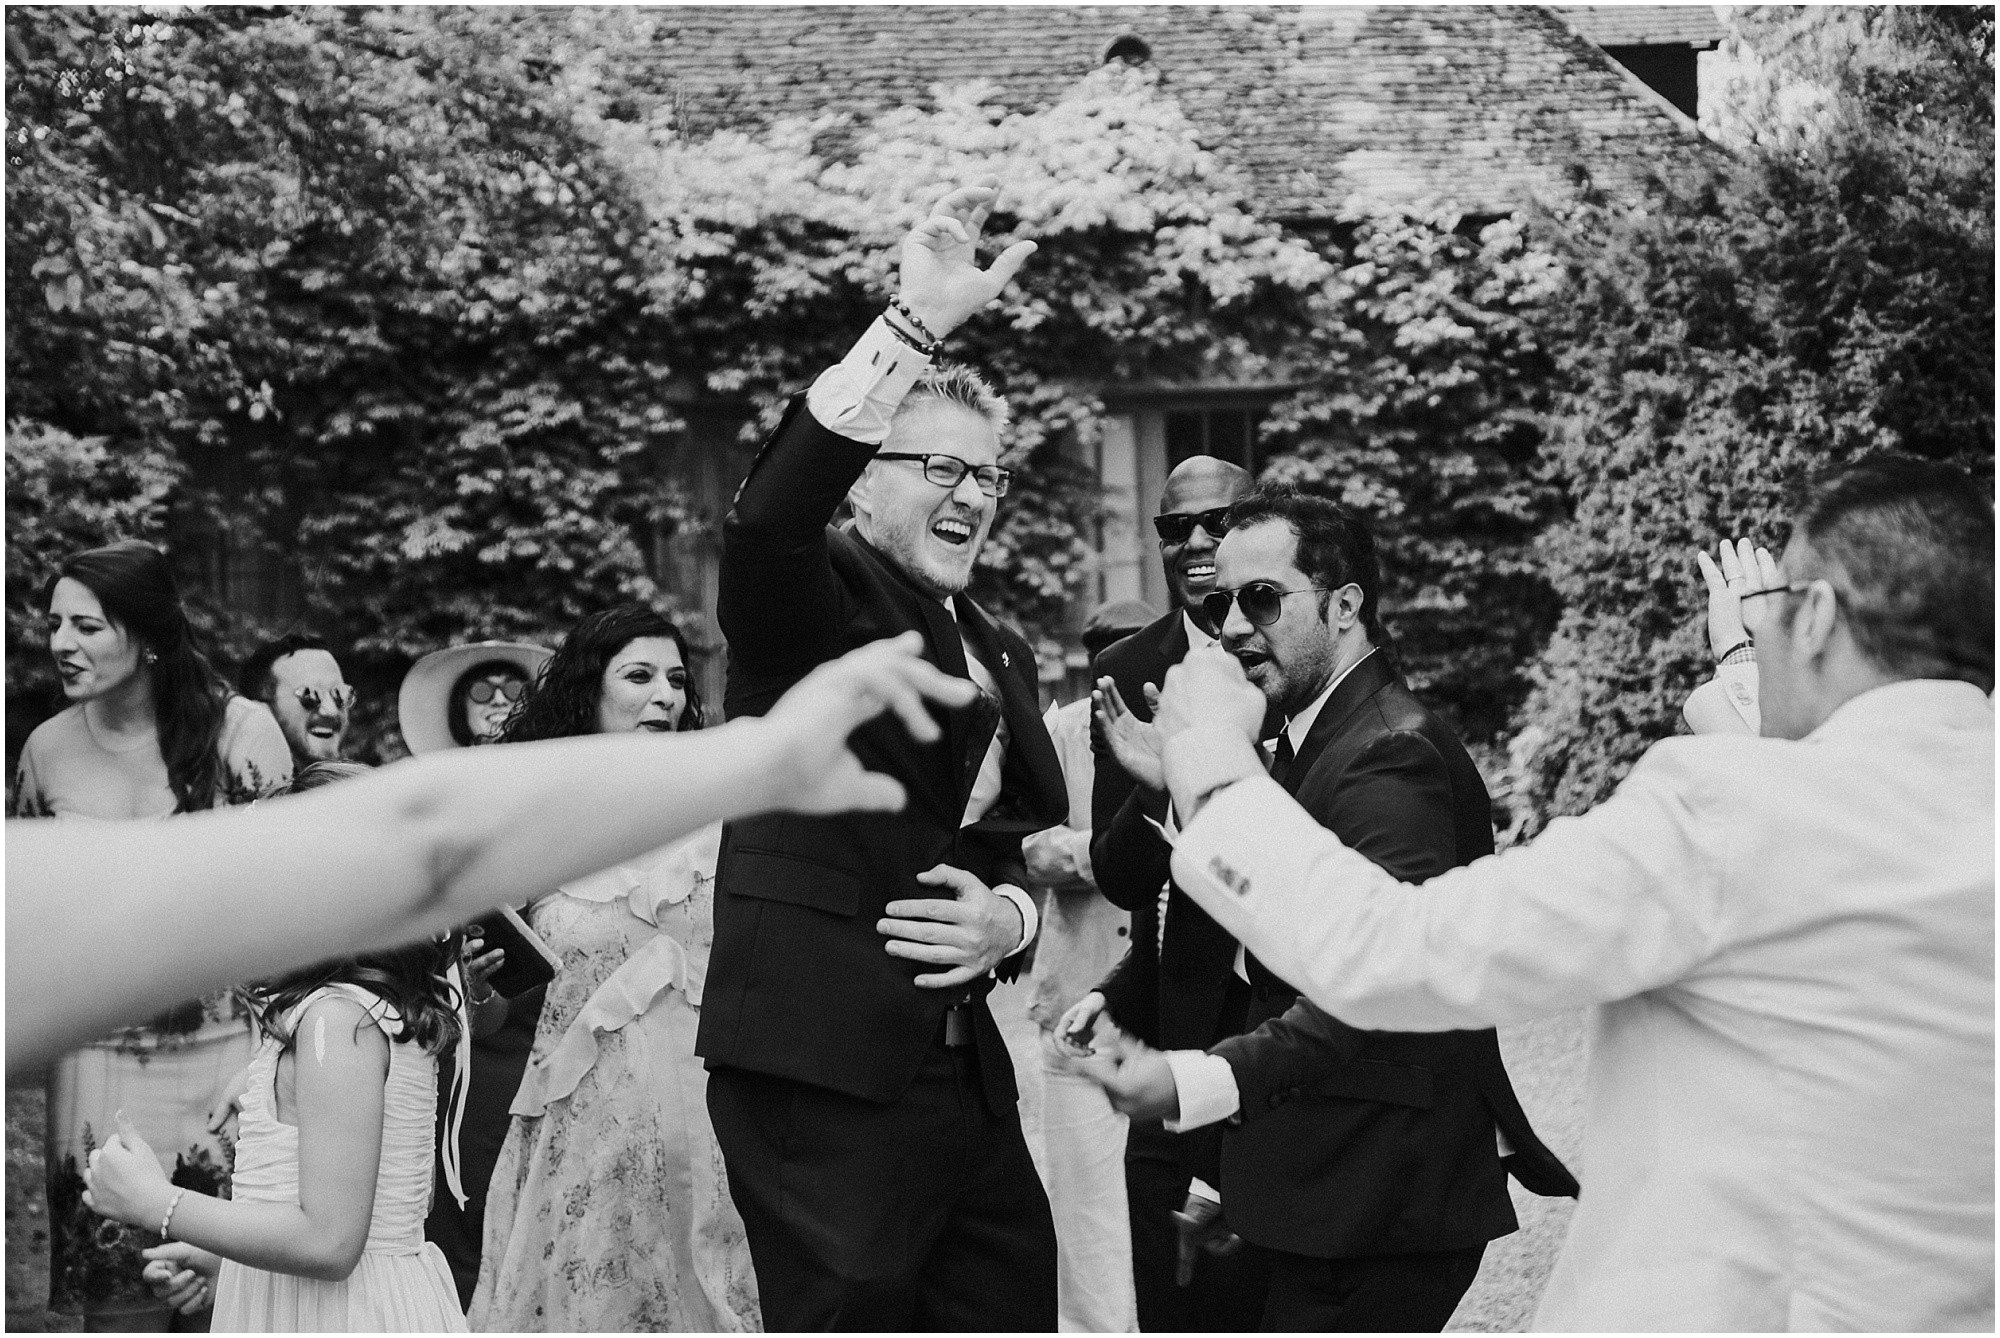 Kateryna-photos-photographer-mariage-chateau-saint-paterne-alencon-normandie-mayenne-le-mans_0050.jpg